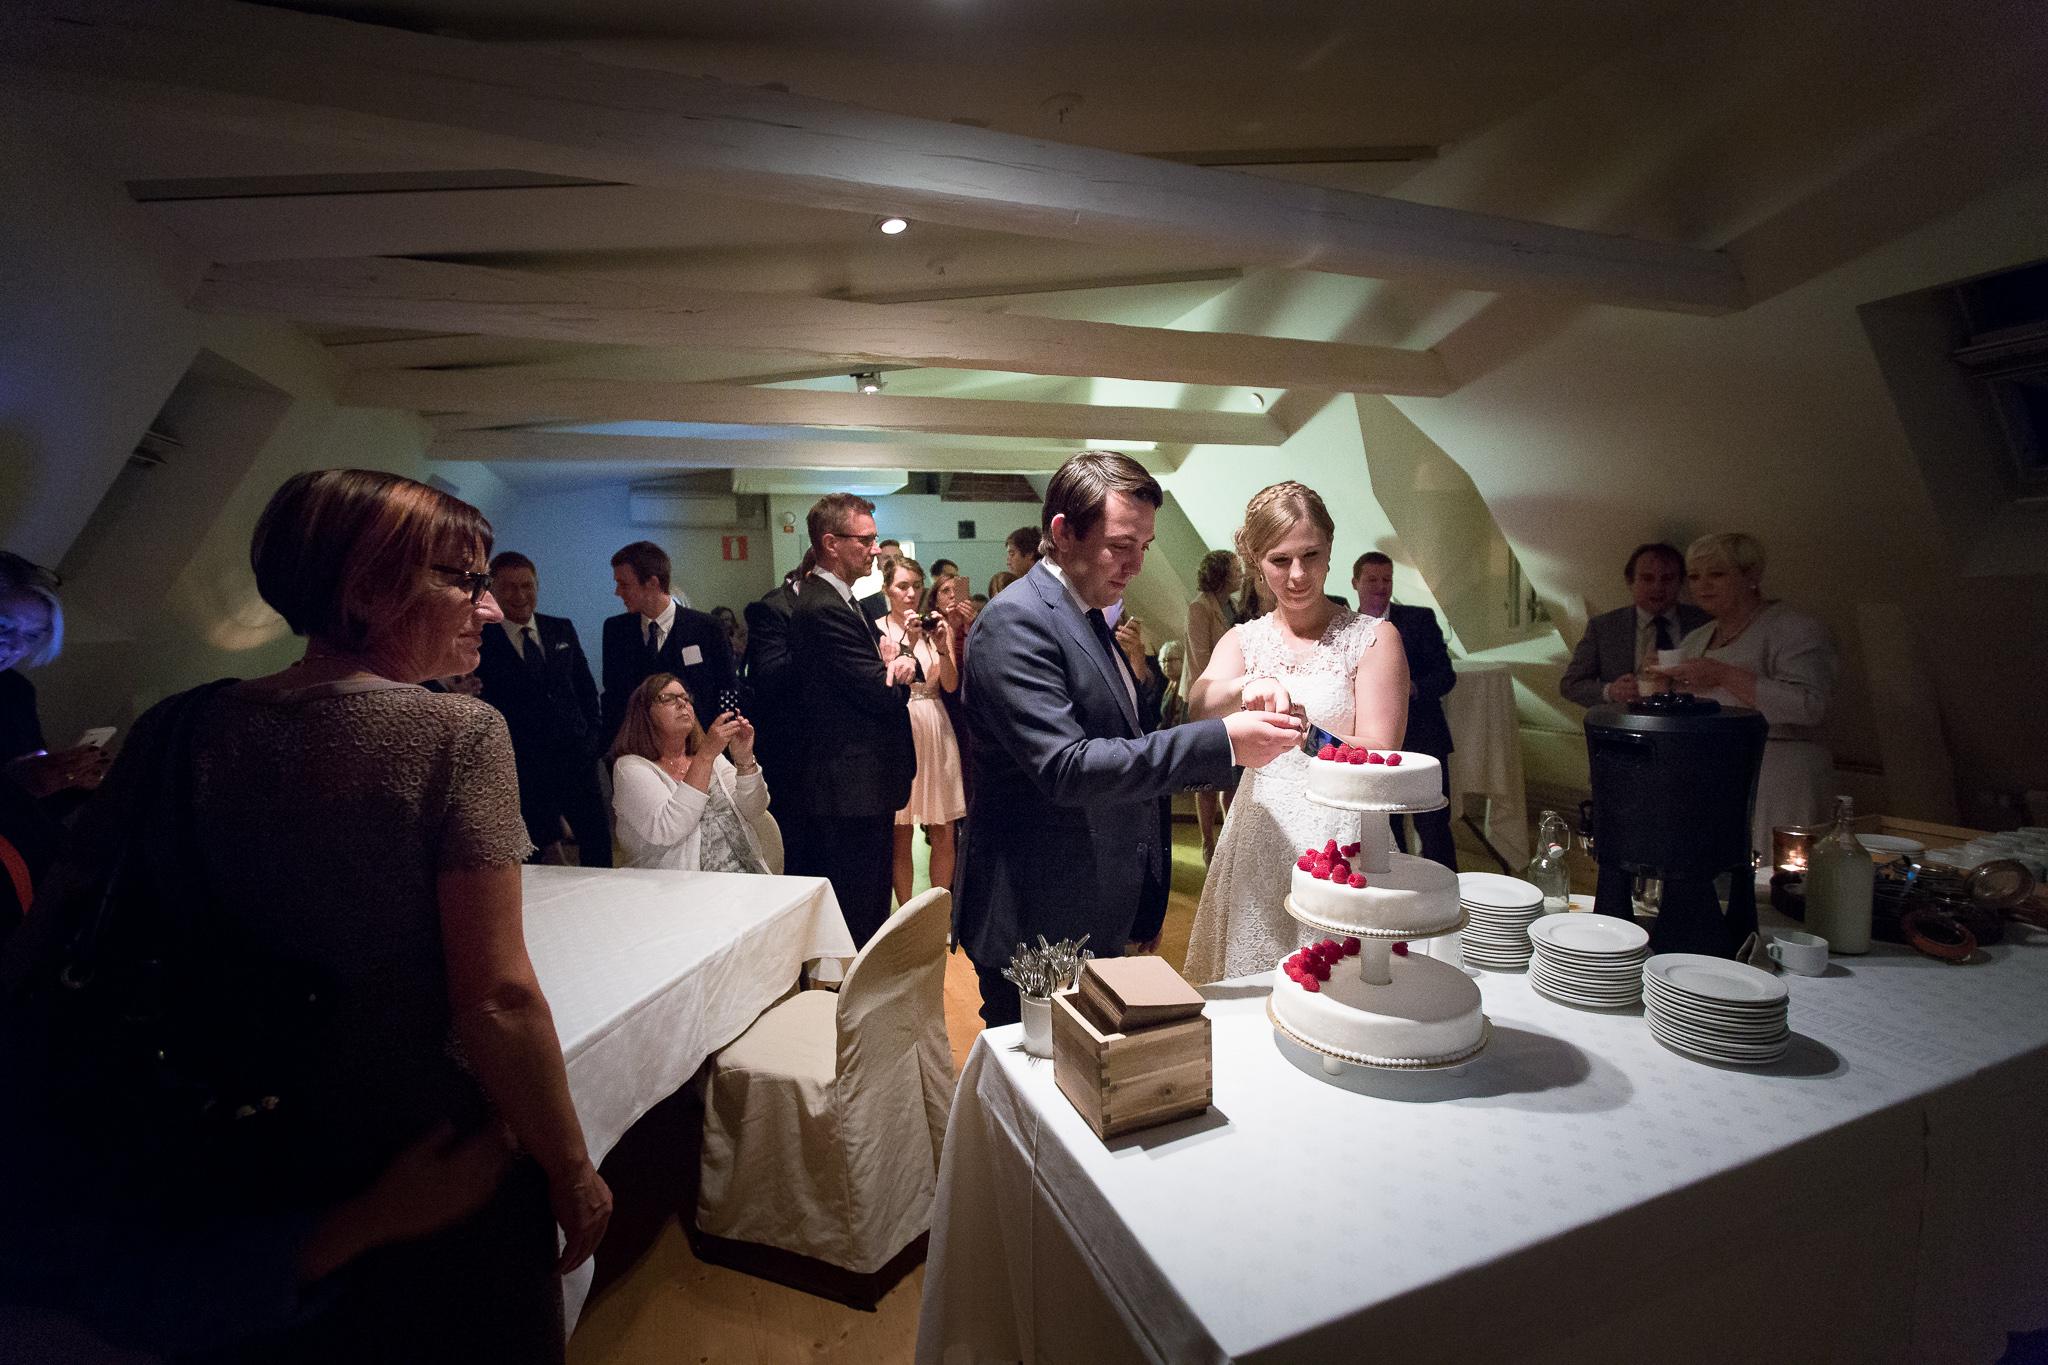 Bröllopsfest Skridskopaviljongen